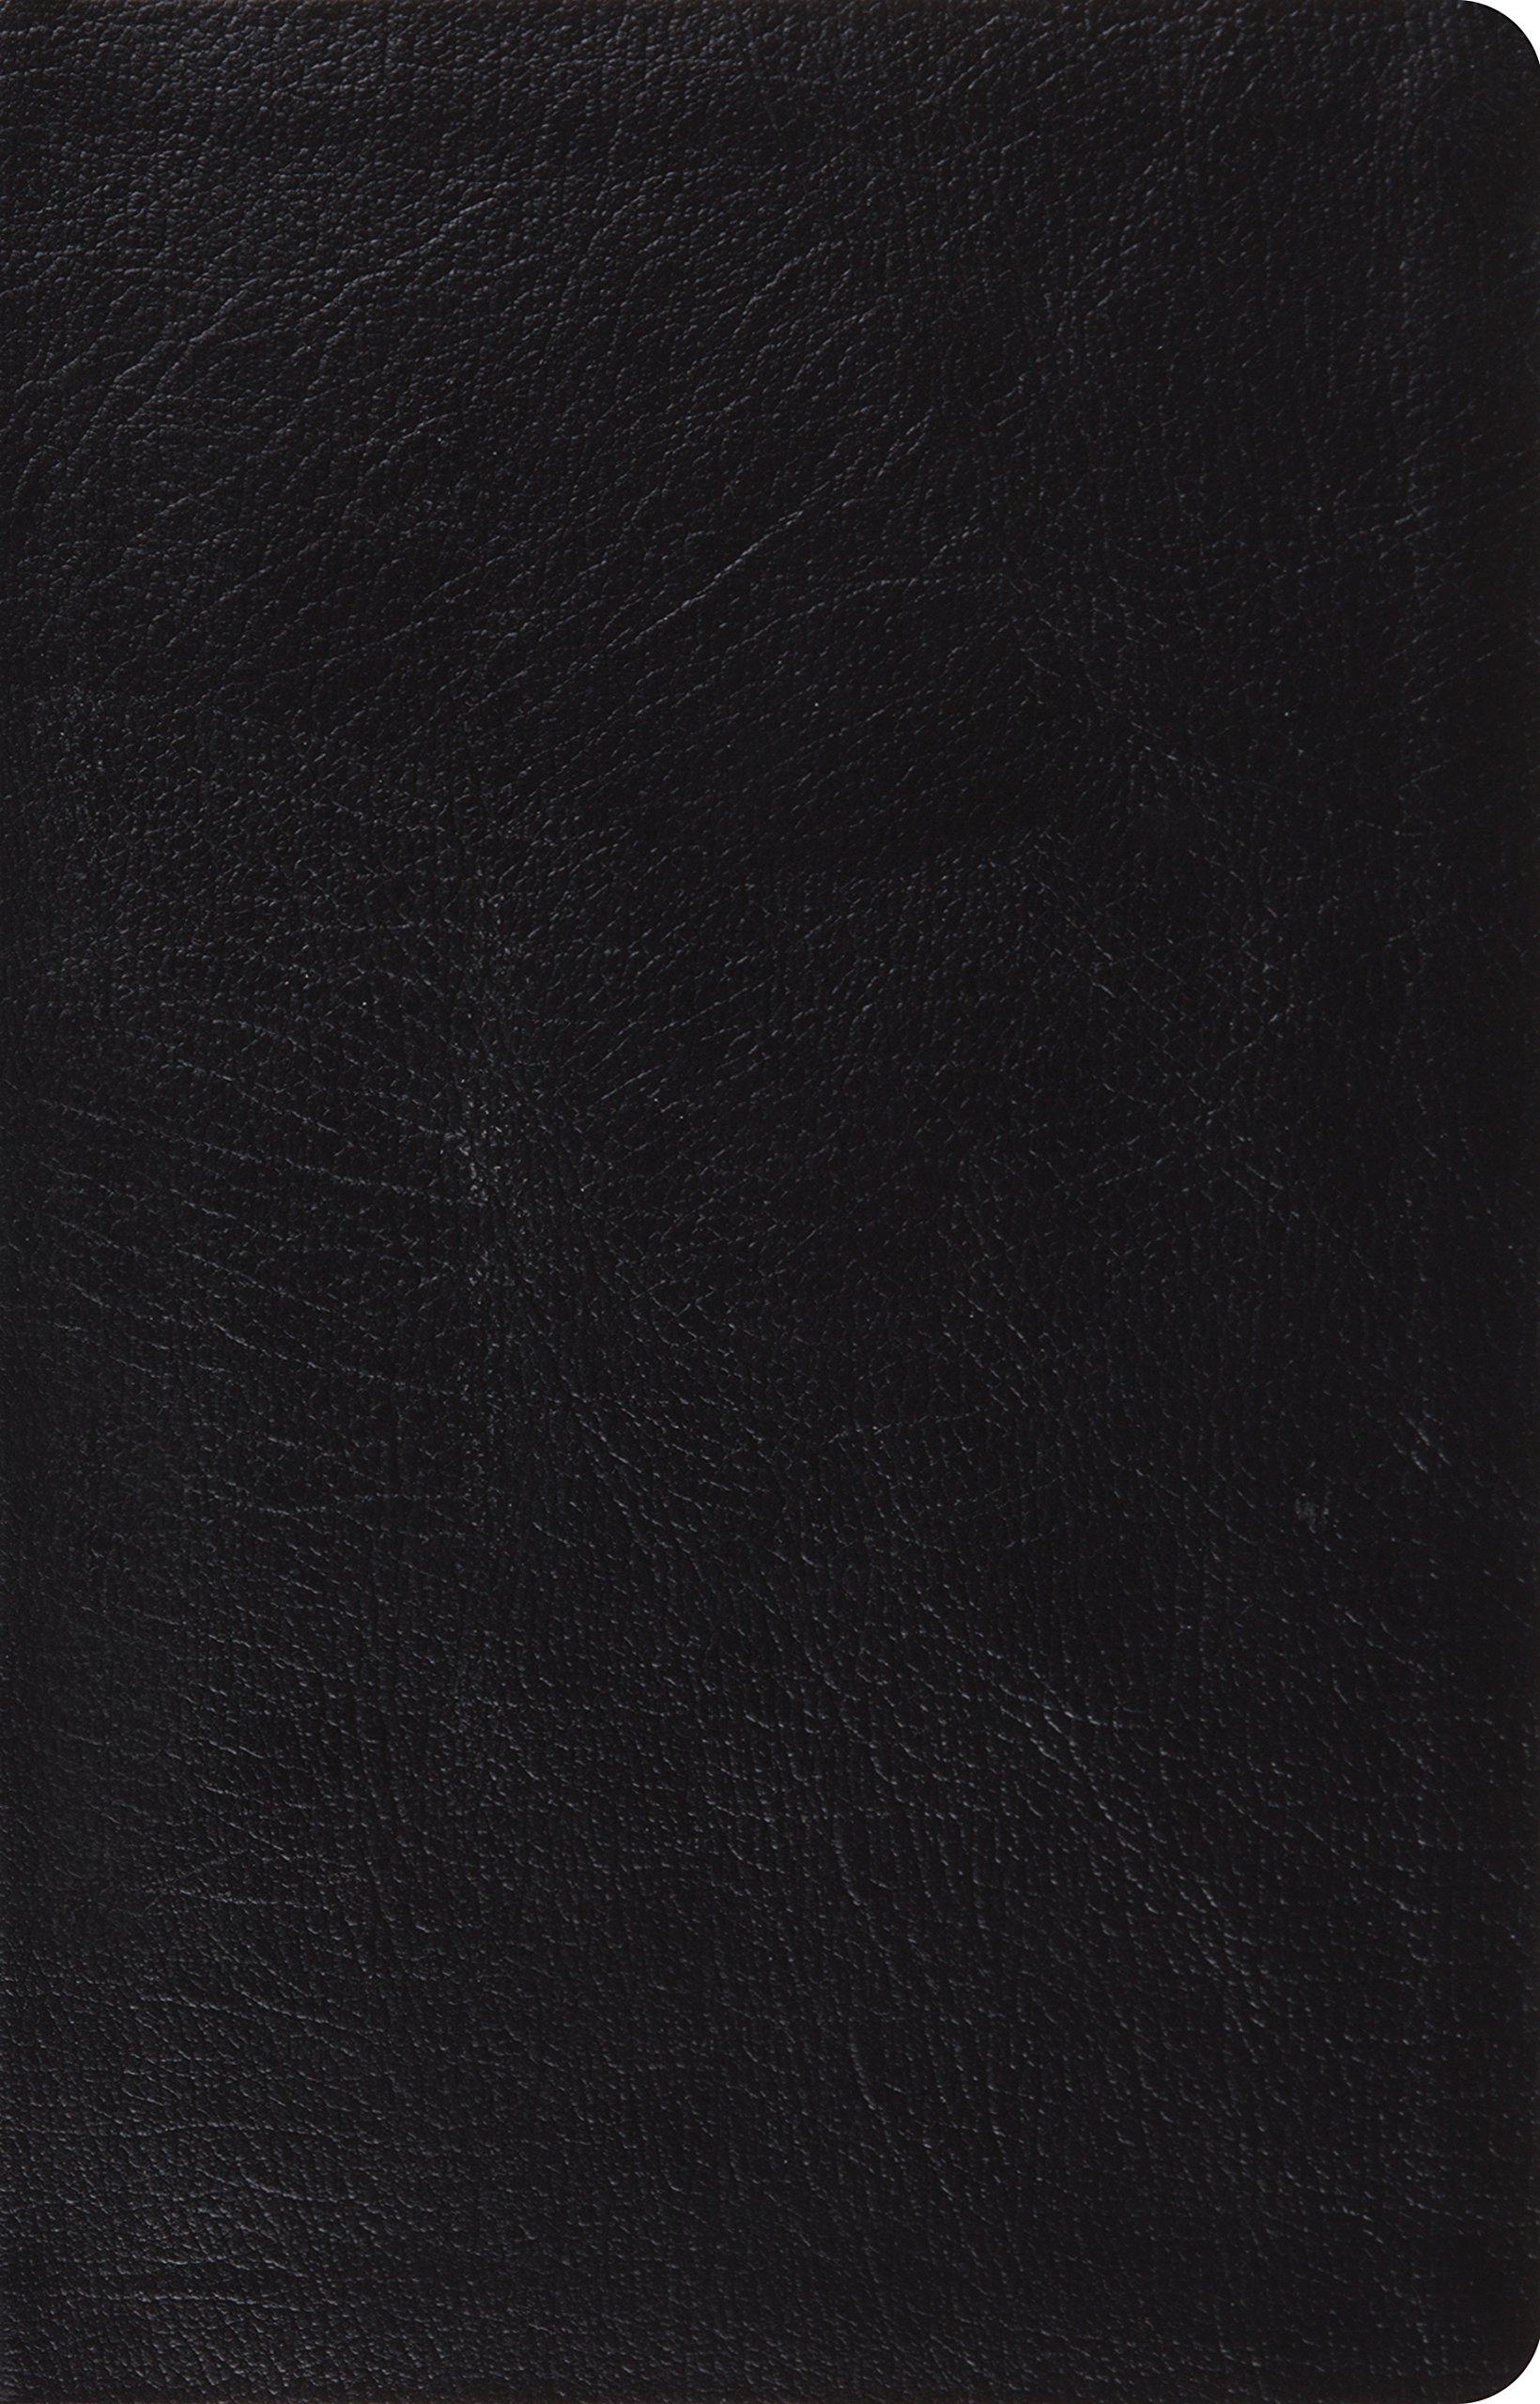 Download ESV Large Print Thinline Reference Bible (Black) PDF